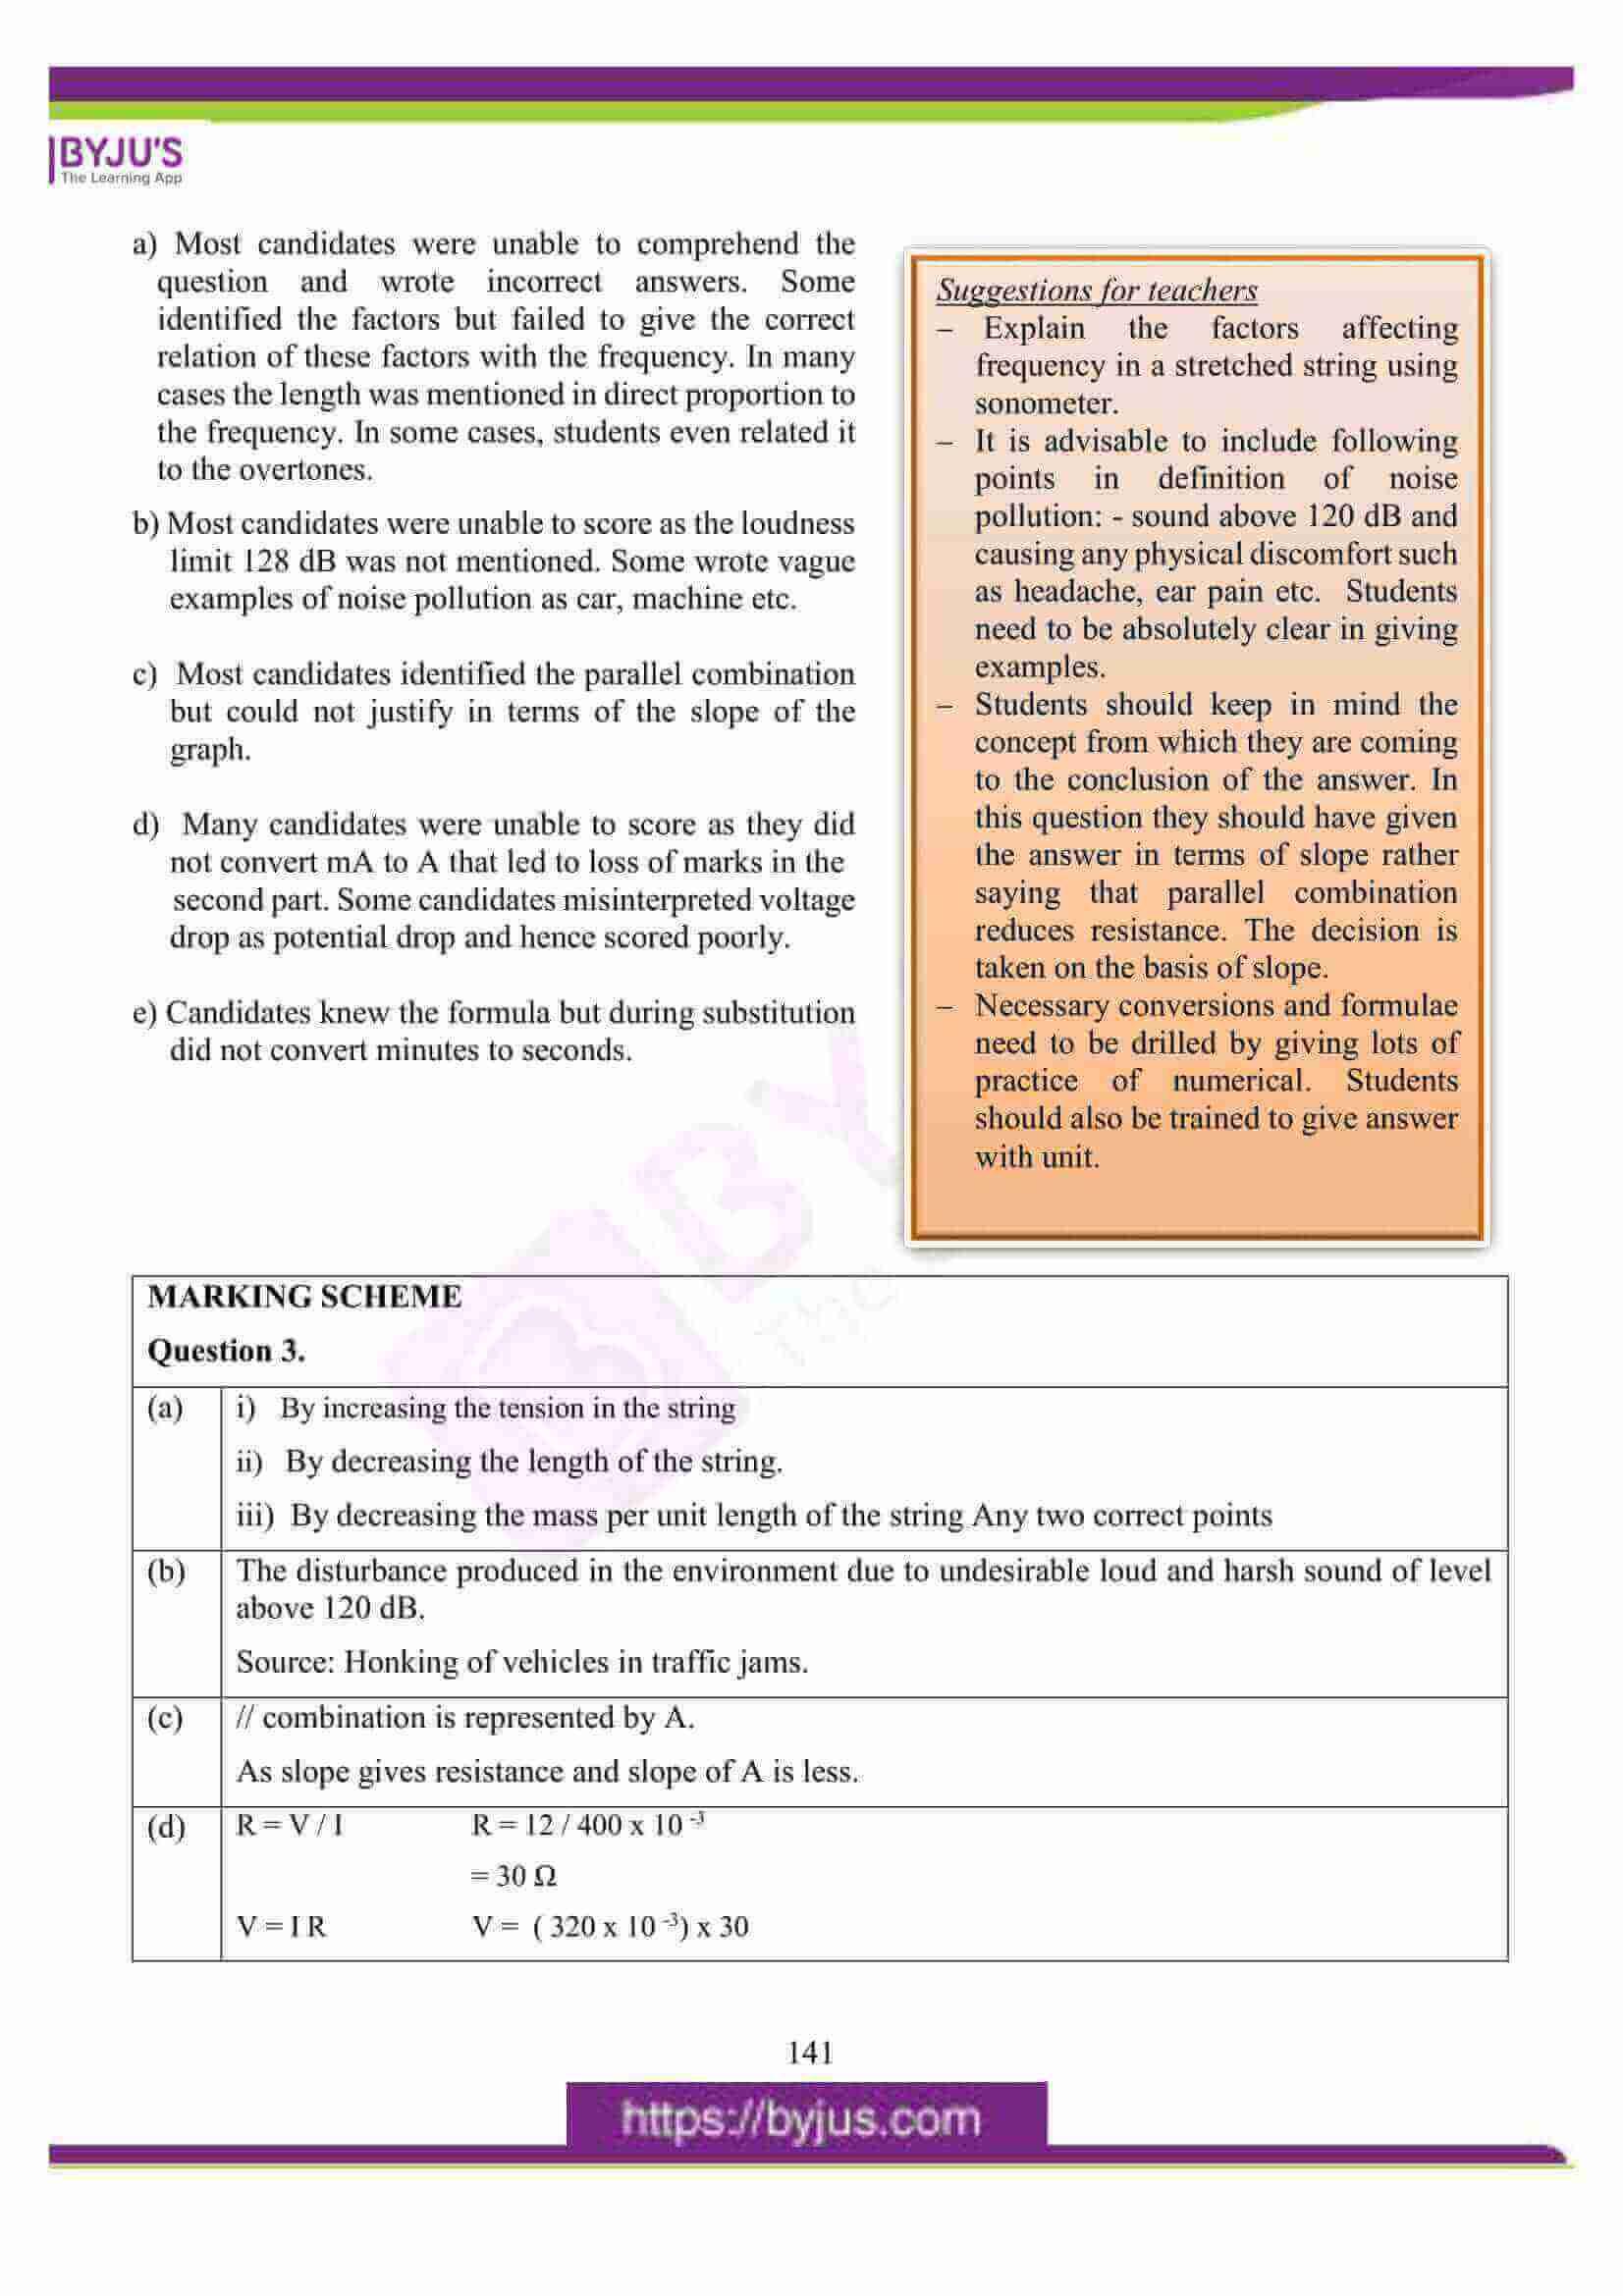 icse class 10 physics question paper solution 2016 06